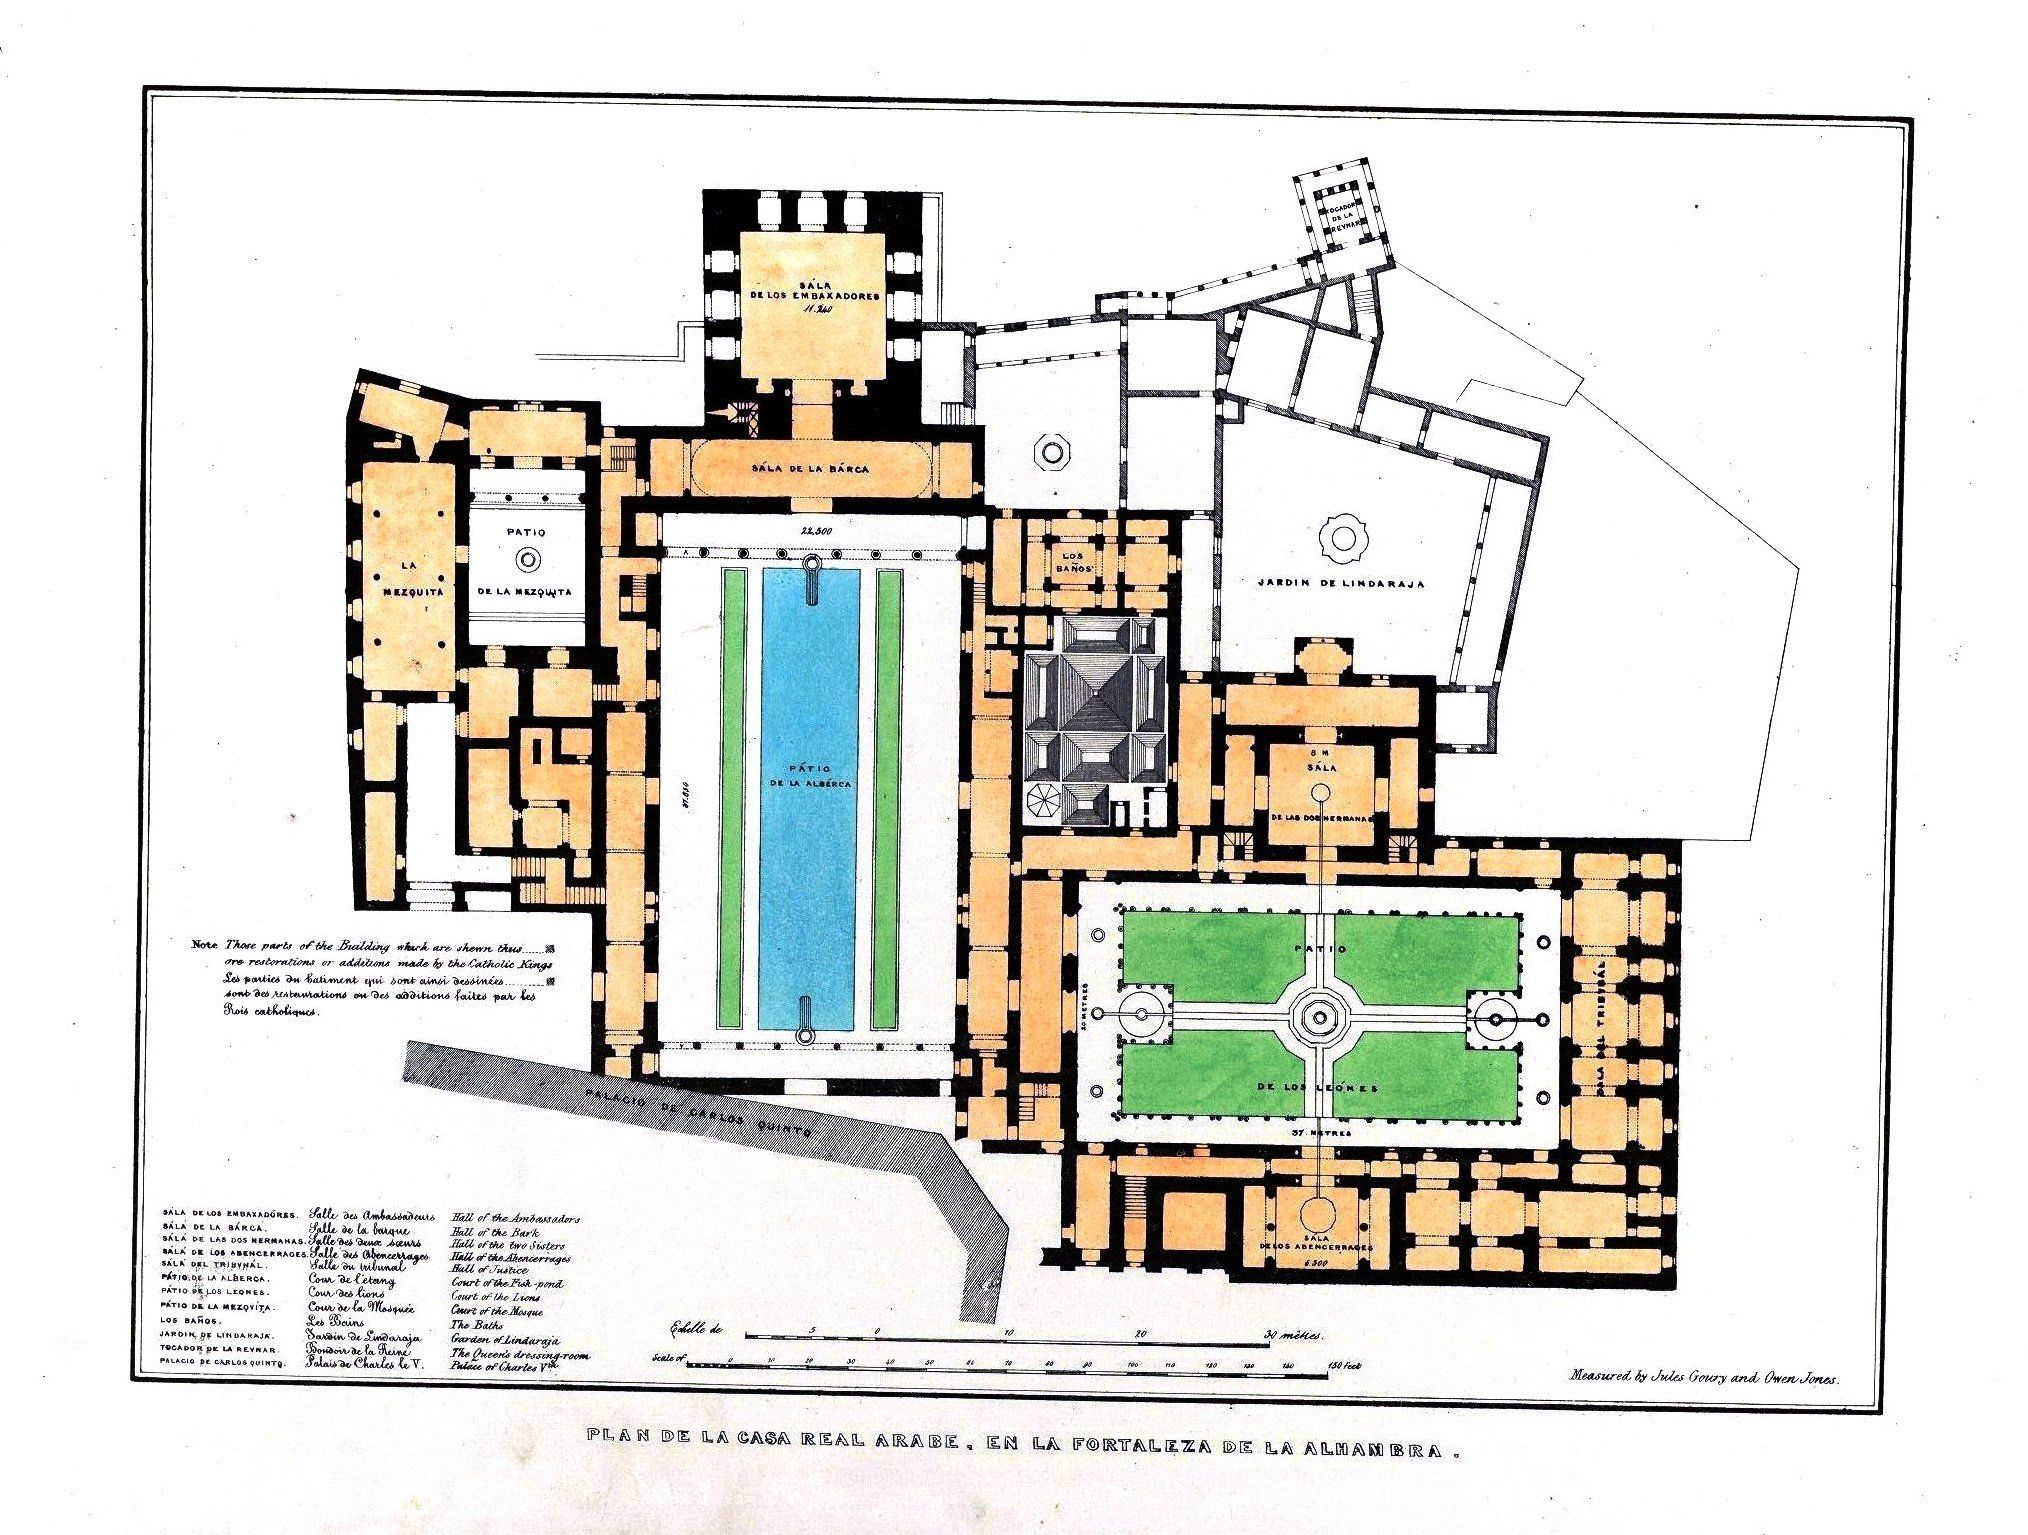 plan de la casa real rabe en la fortaleza de la alhambra